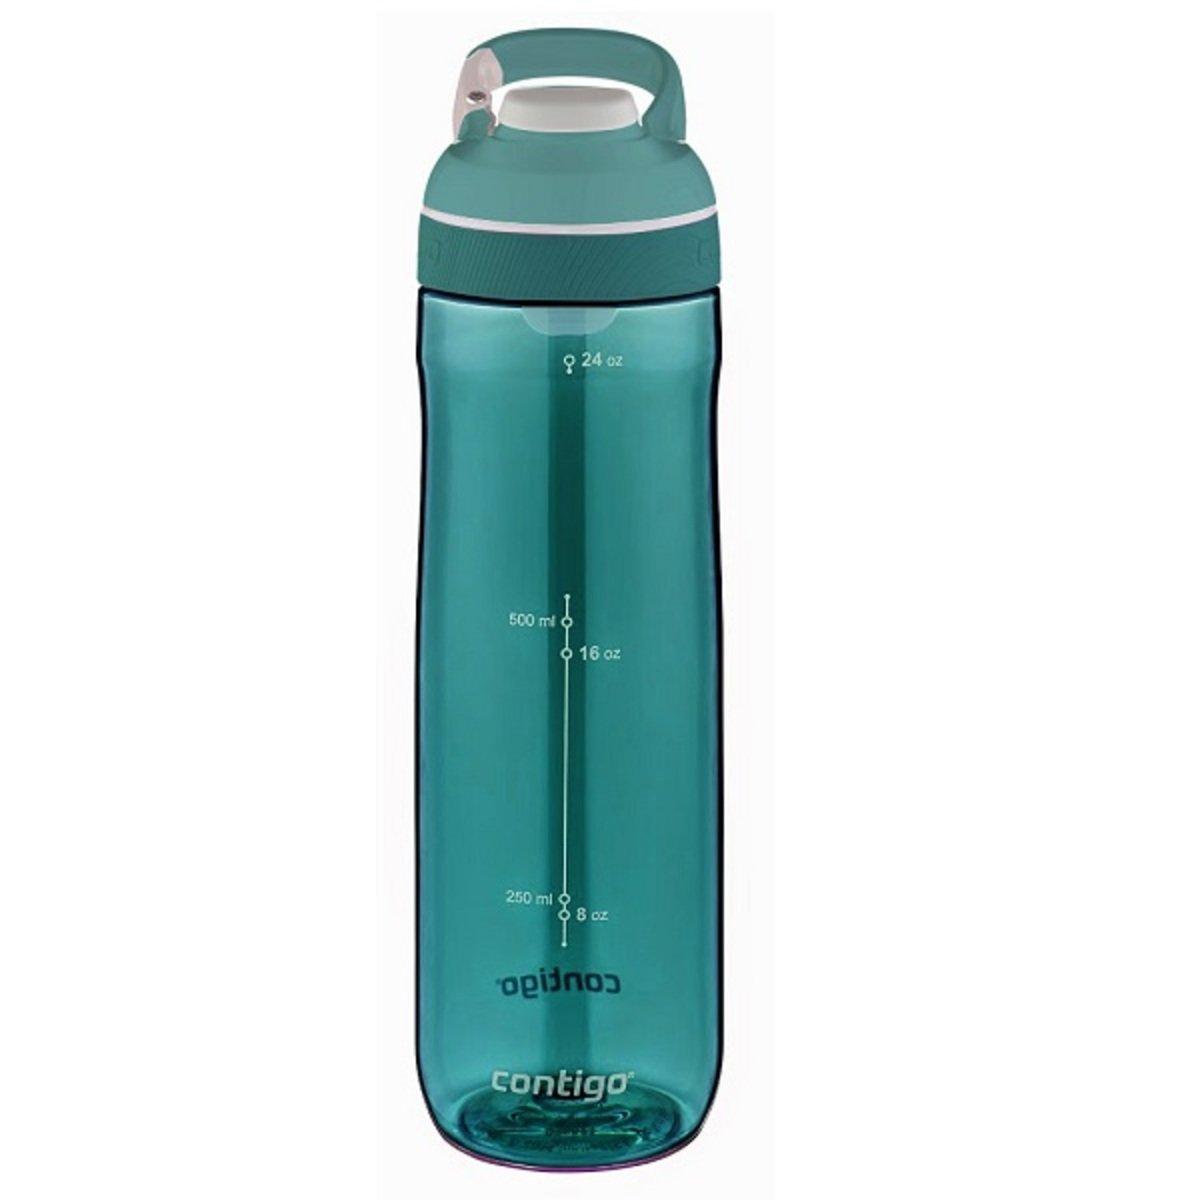 Cortland 運動偷閒杯 - 深海藍杯深海藍蓋